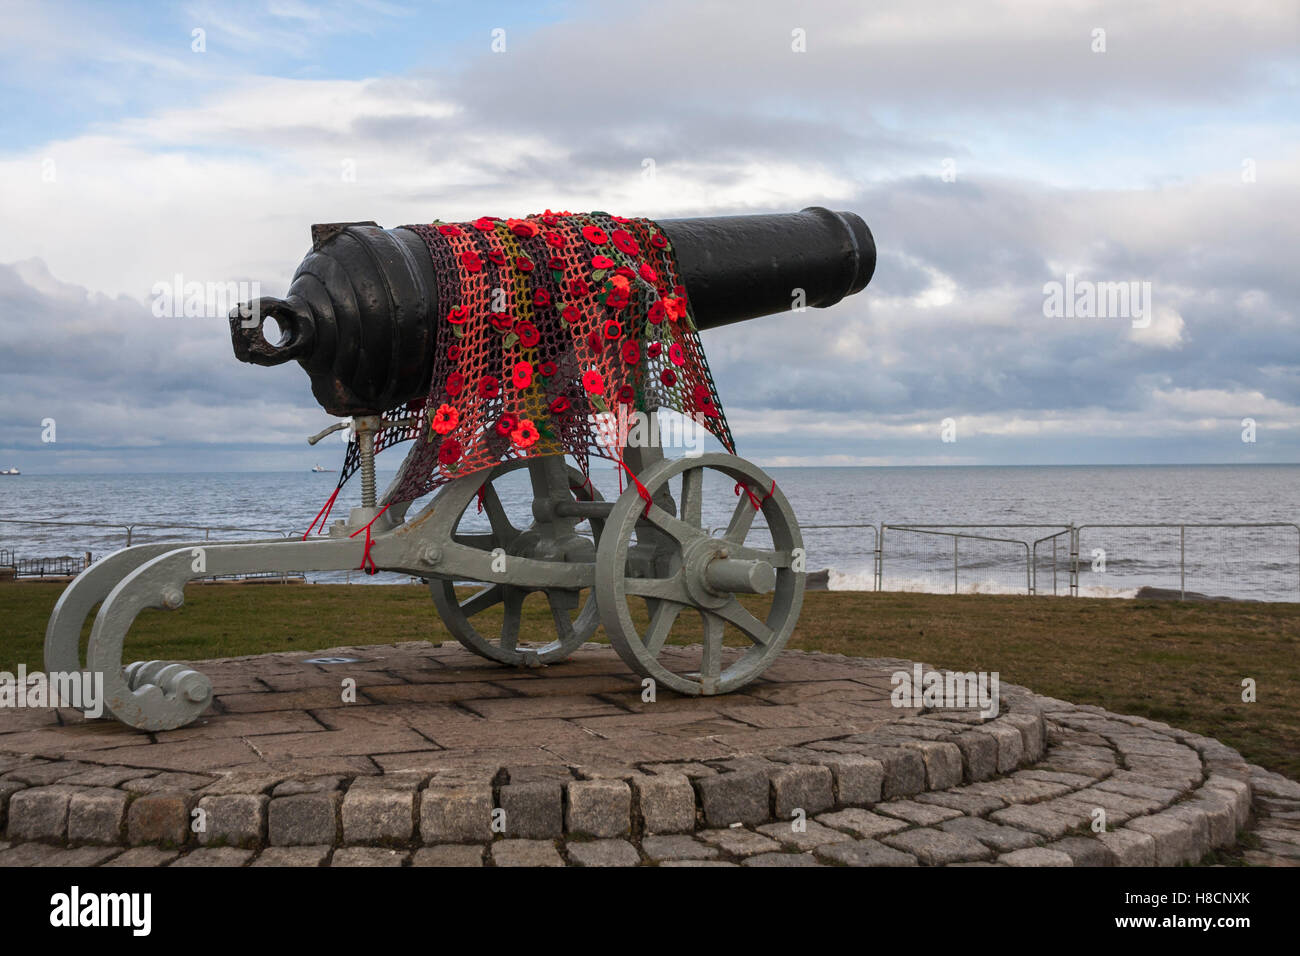 Poppies draped across the Sebastopol canon at Hartlepool Headland to commemorate  Rememberance Day - Stock Image